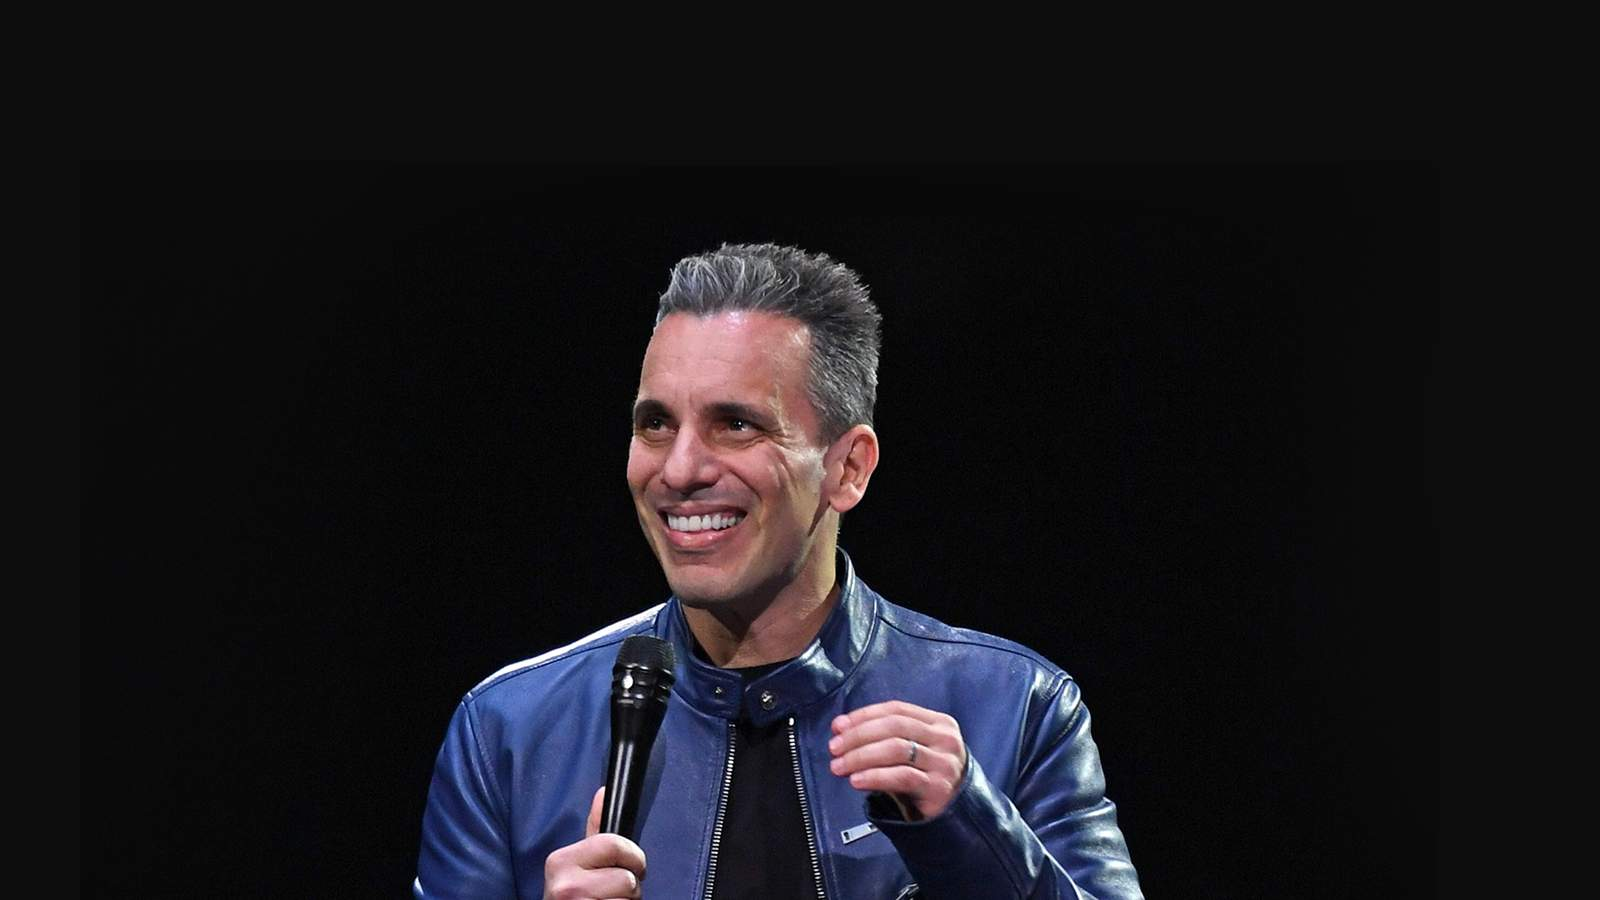 Sebastian Maniscalco (Rescheduled from 3/14/2020, 7/25/2020, 4/24/2021)